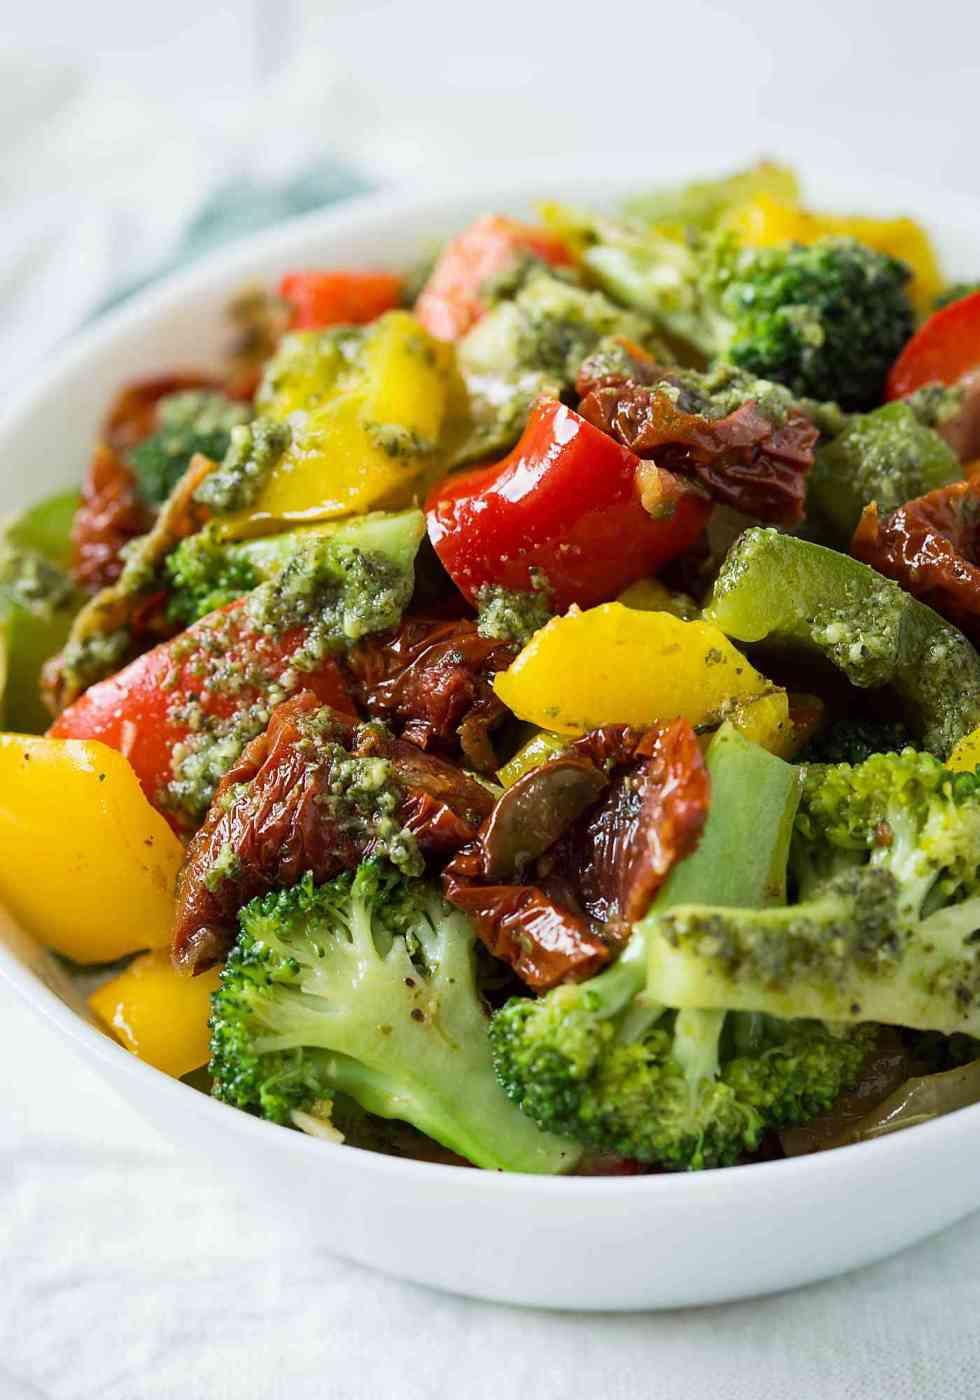 Bell Pepper Recipes: Veggie Stir Fry